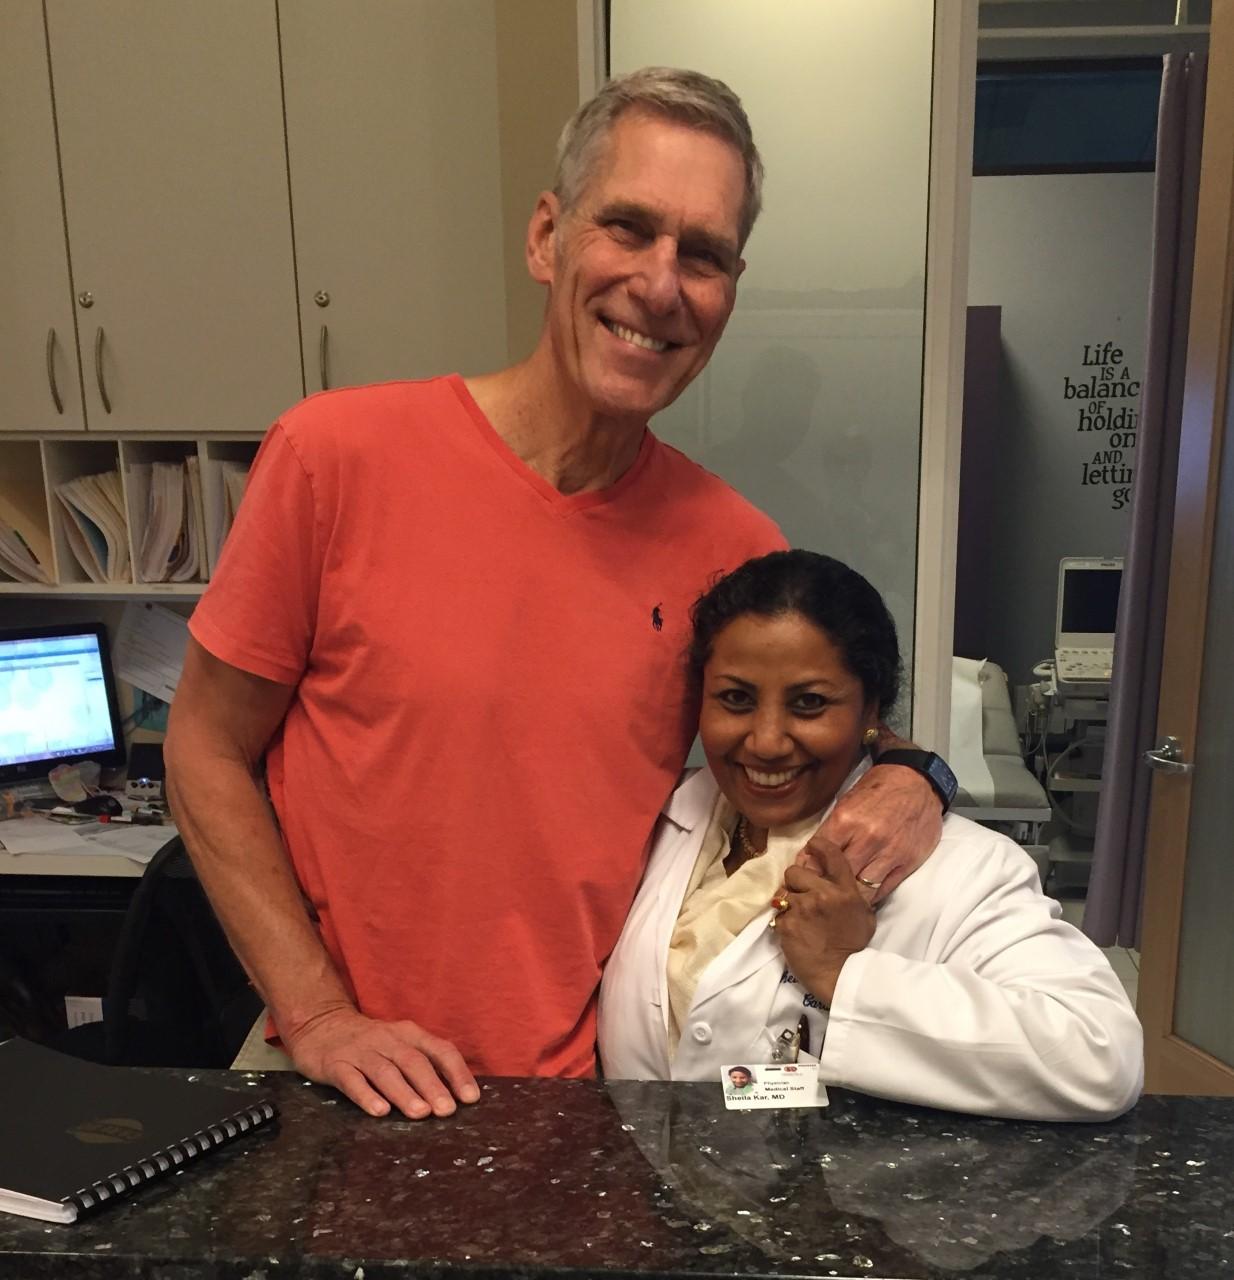 Sheila Kar with happy patient photo